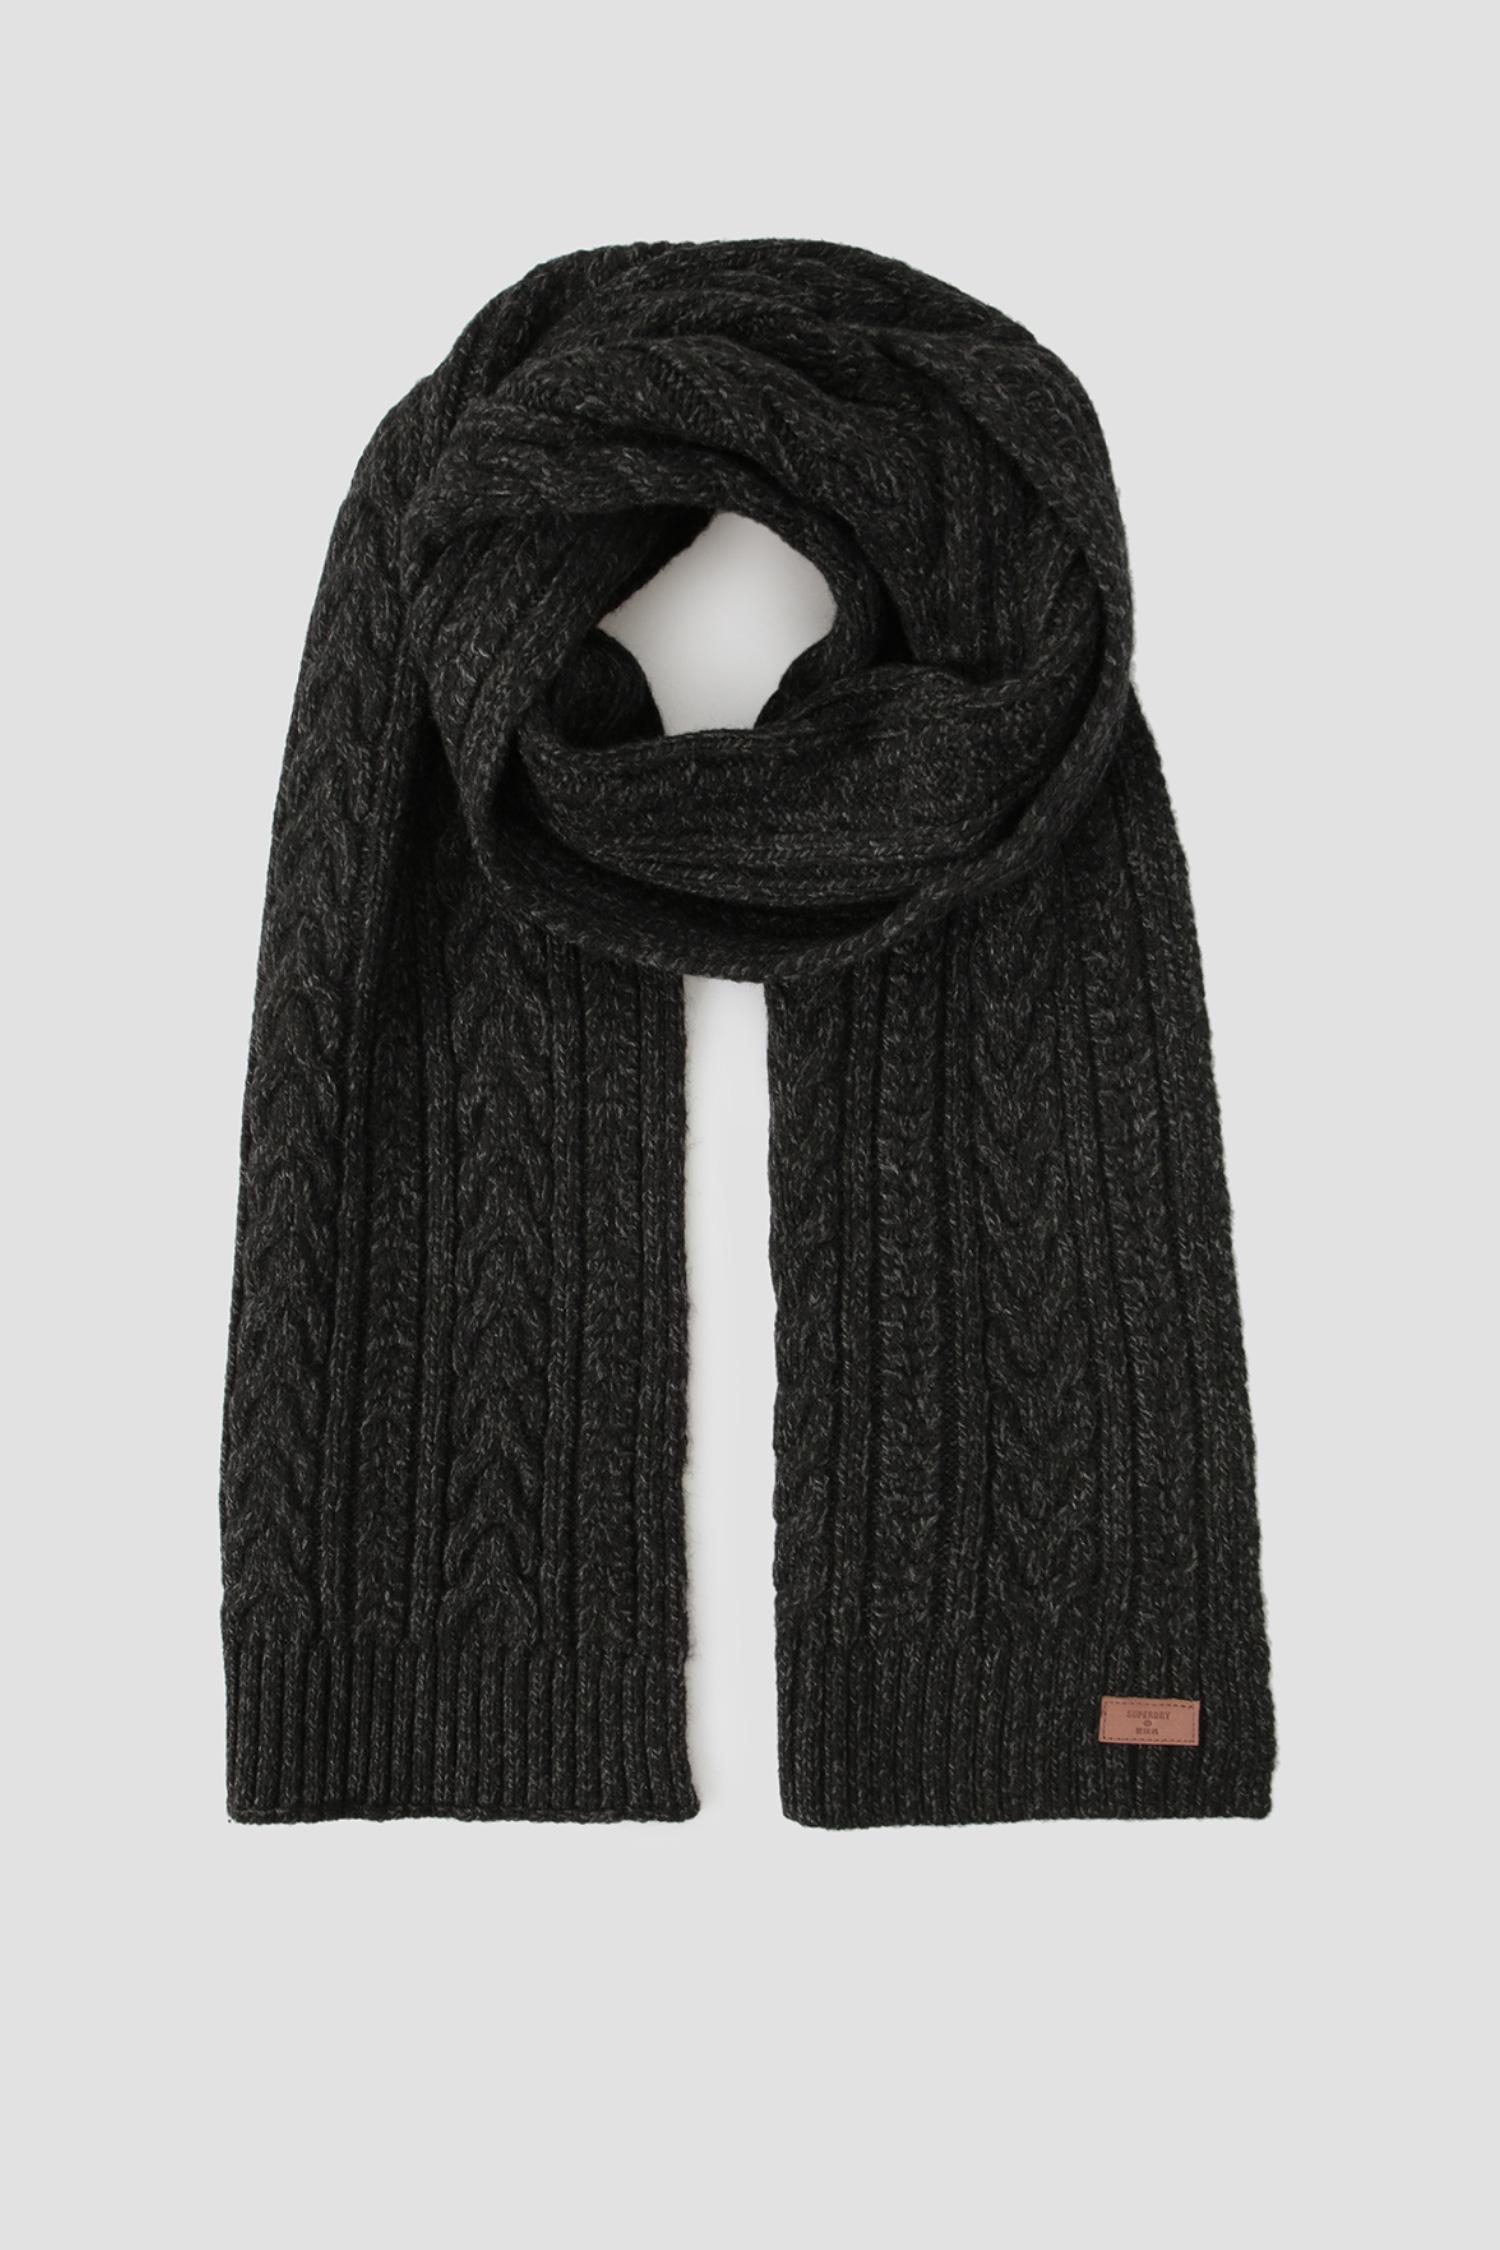 Черный шарф для парней SuperDry M9310015A;V6K